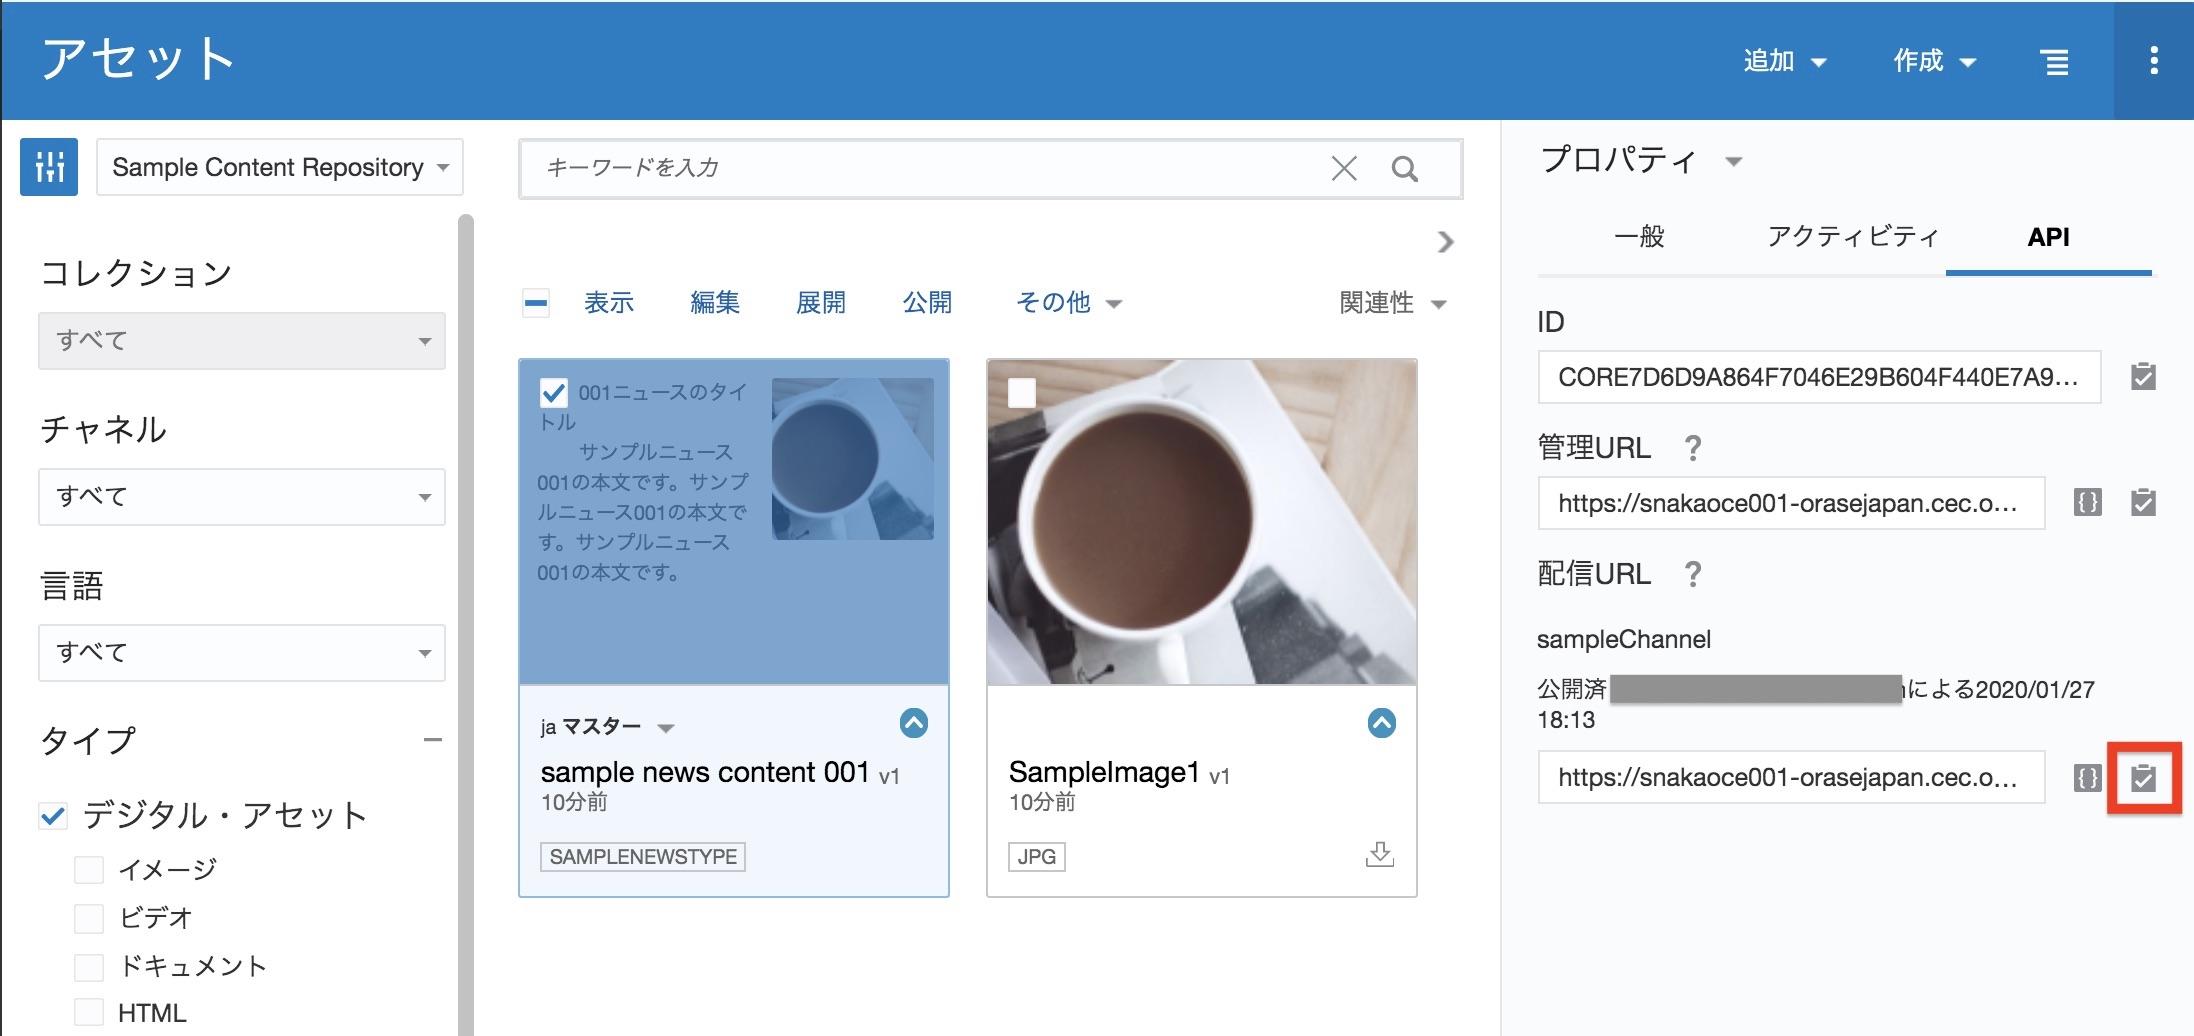 image_oce44.jpg